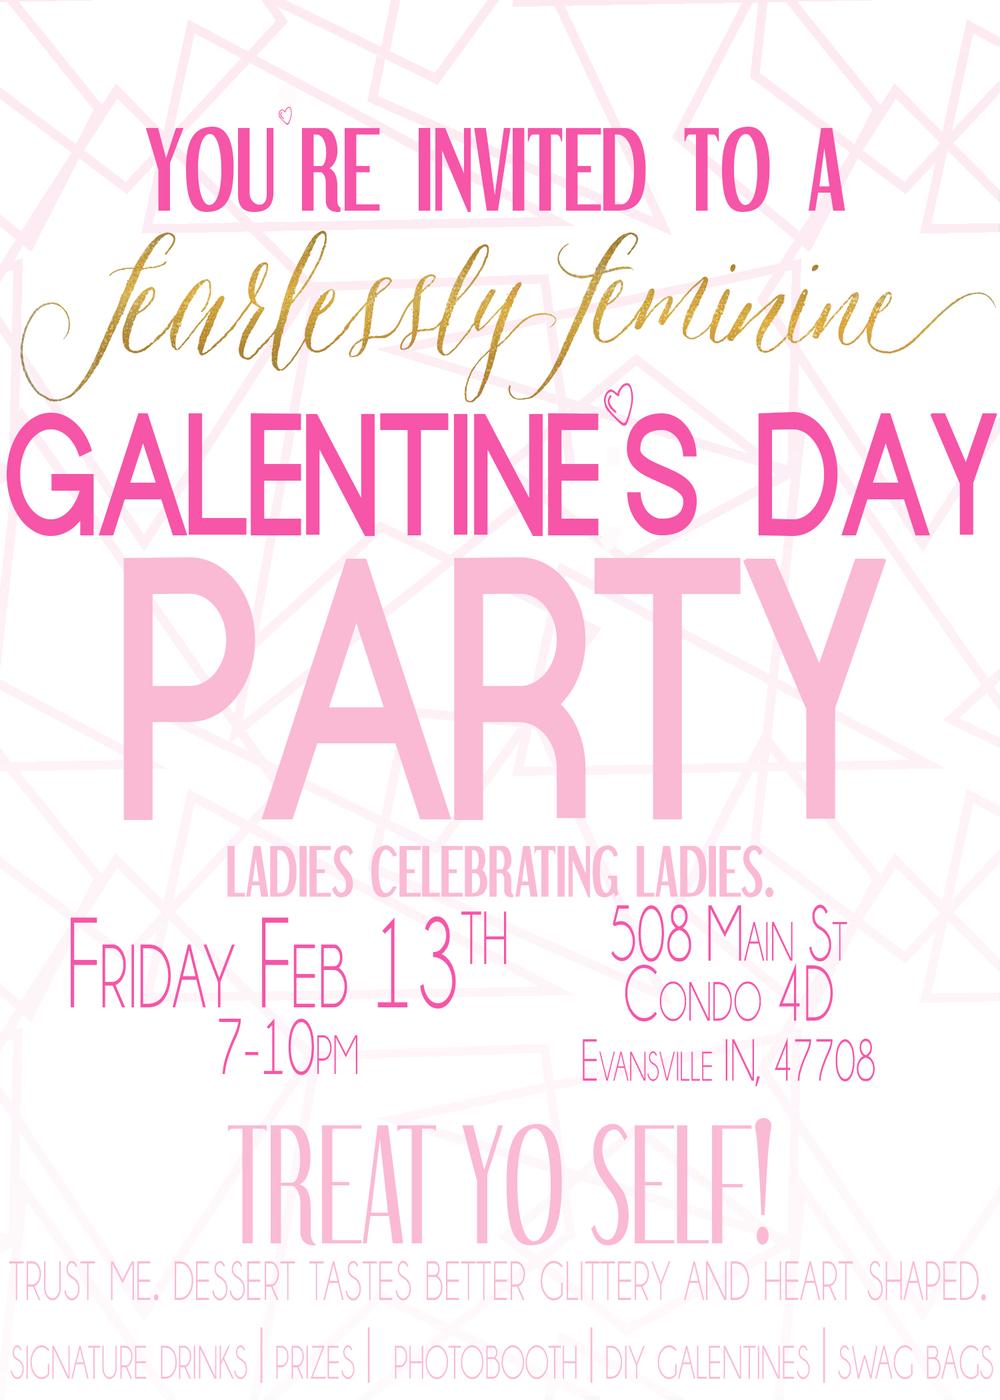 Ladies celebrating Ladies: Galentine's Day | Evansville IN ...